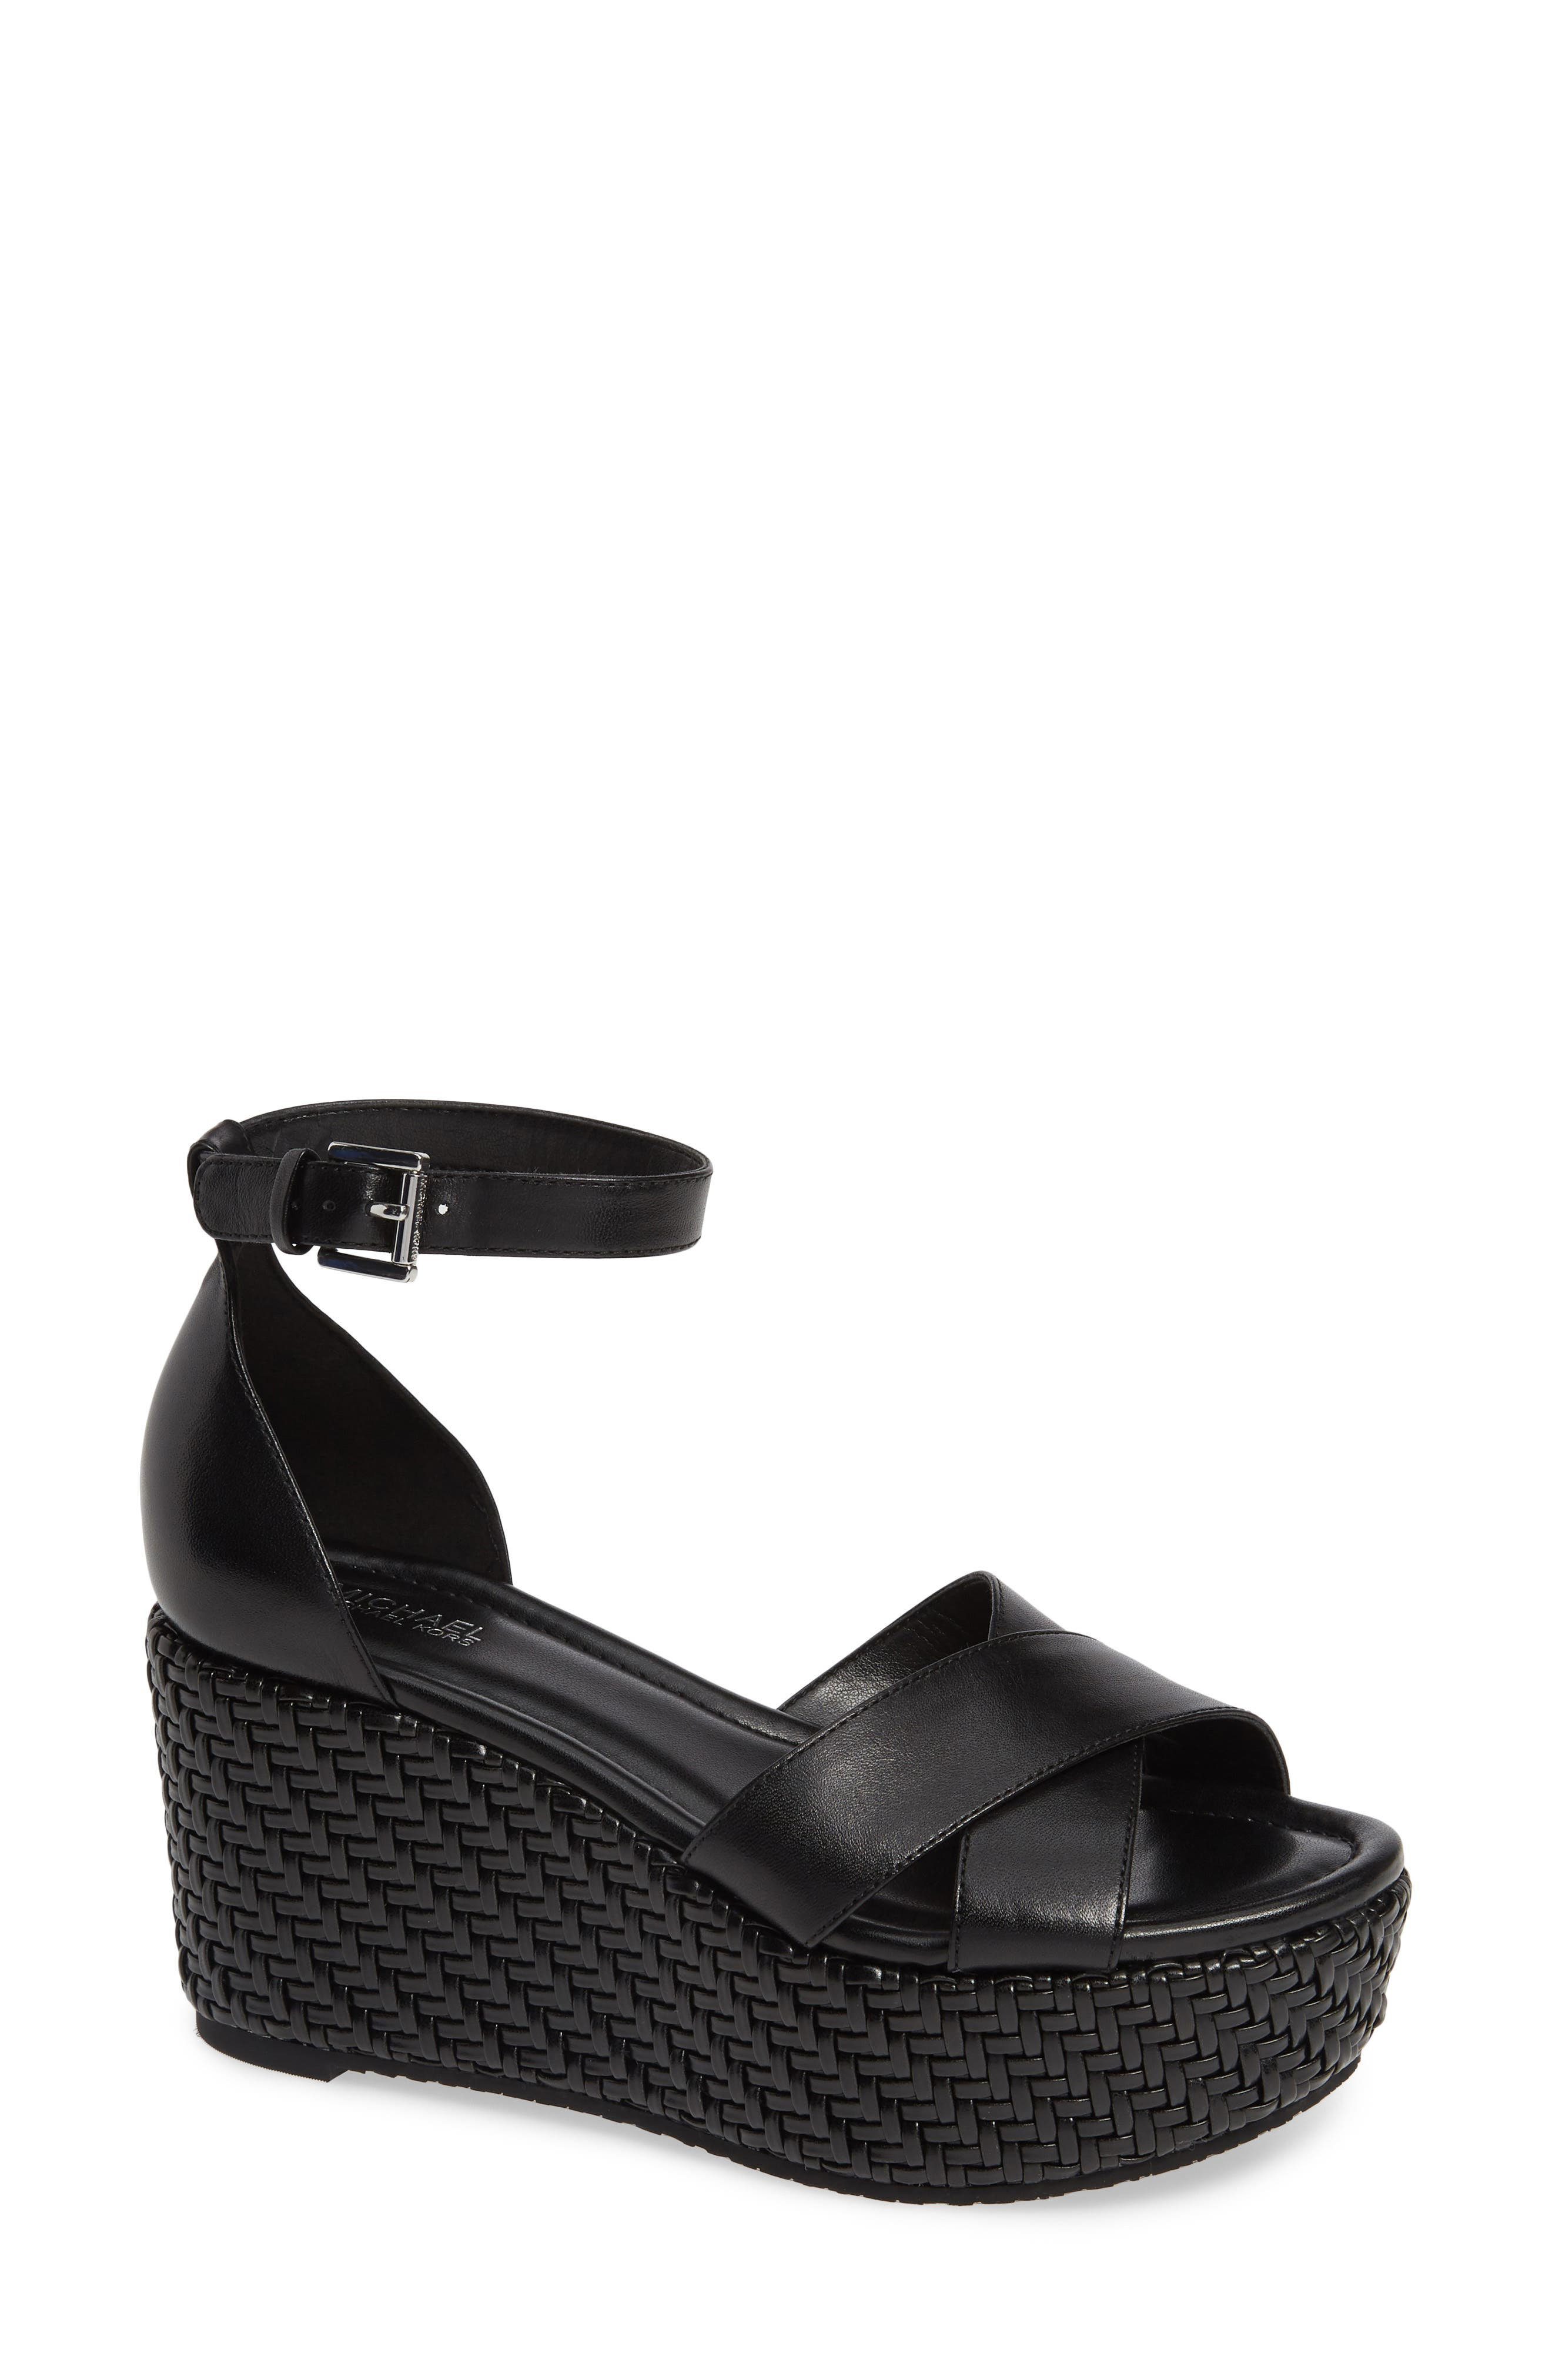 Desiree Woven Wedge Sandals in Black Vachetta Leather